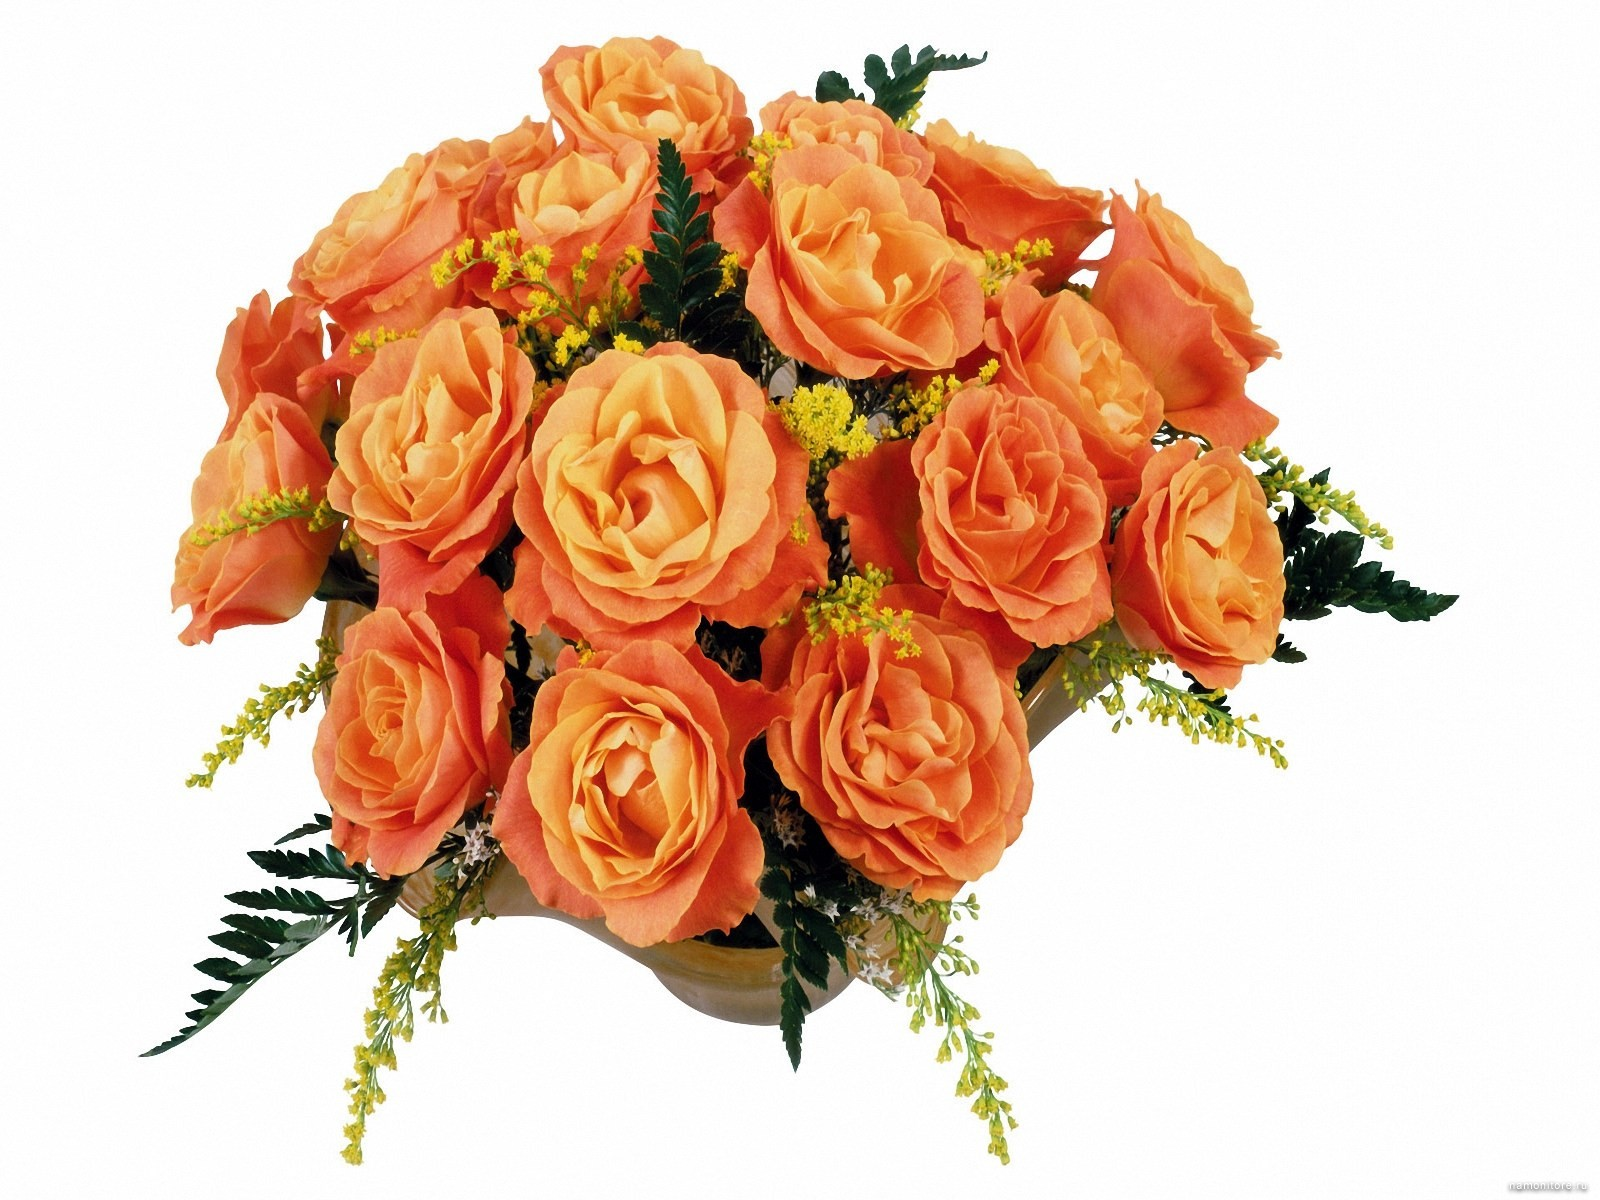 Yellow Rose clipart orange rose Clipart roses roses orange yellow